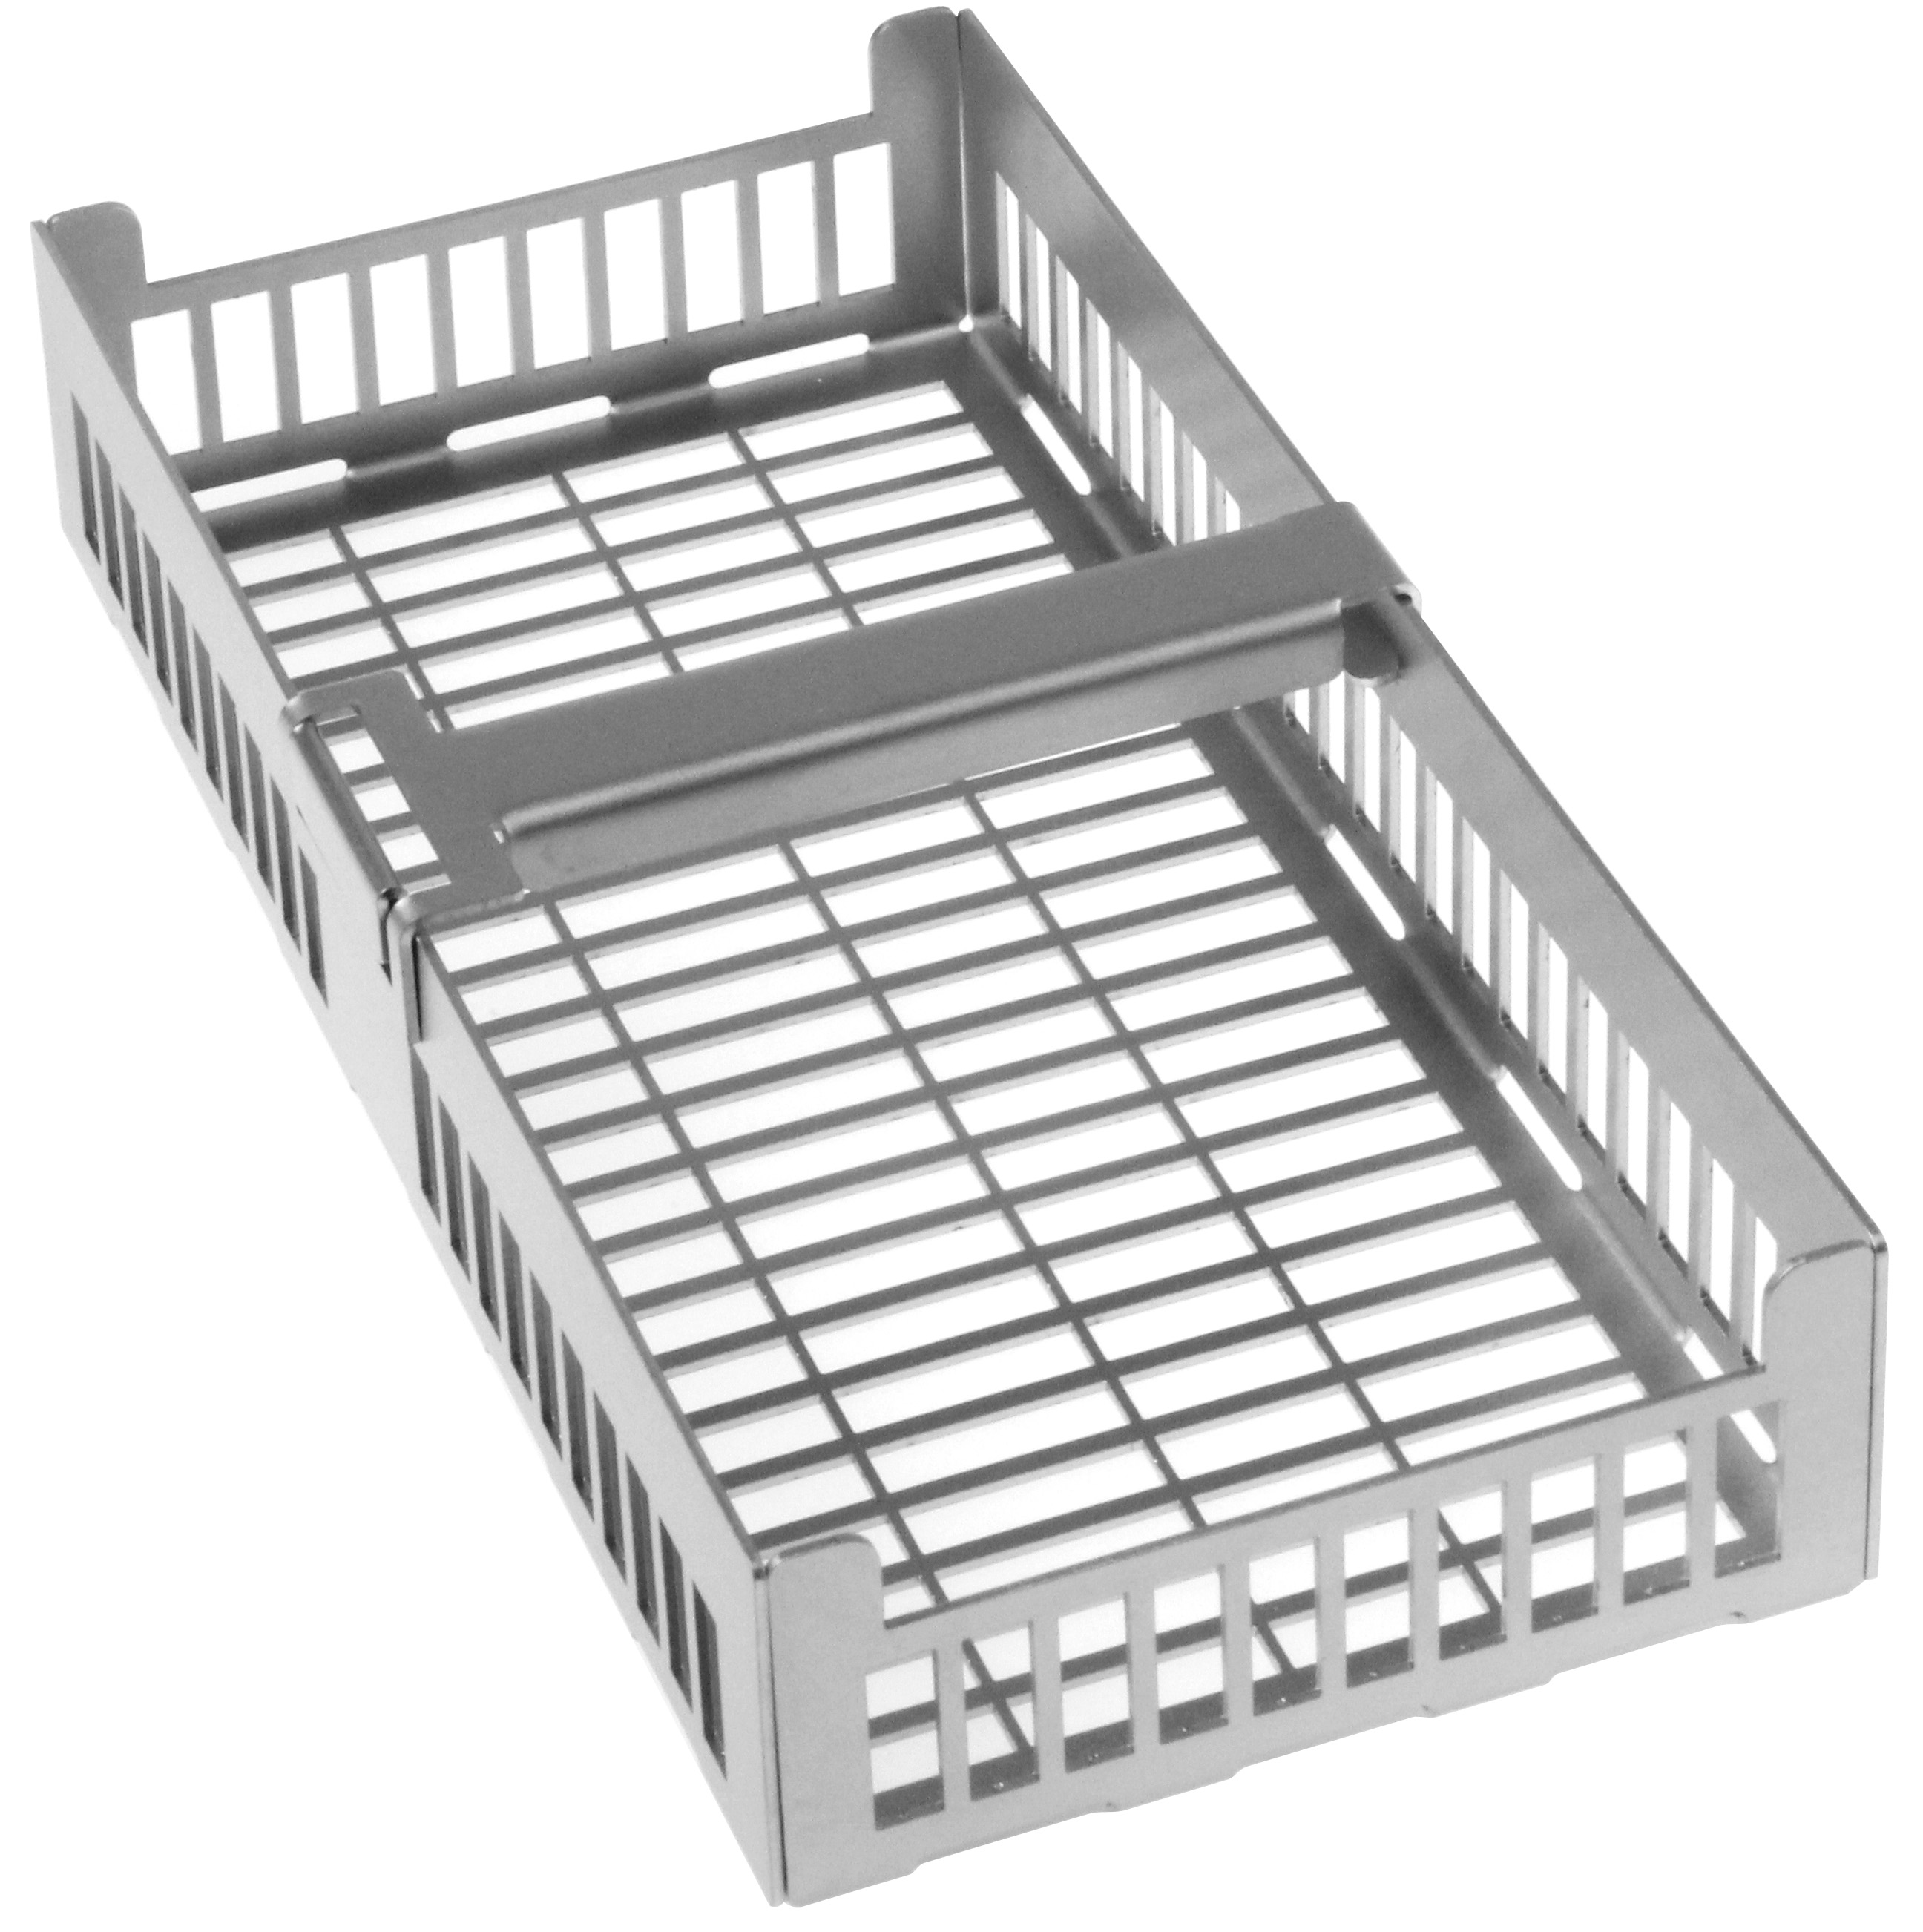 BASIC CLIP Wash Tray  (177,5x84,5x33,0mm)